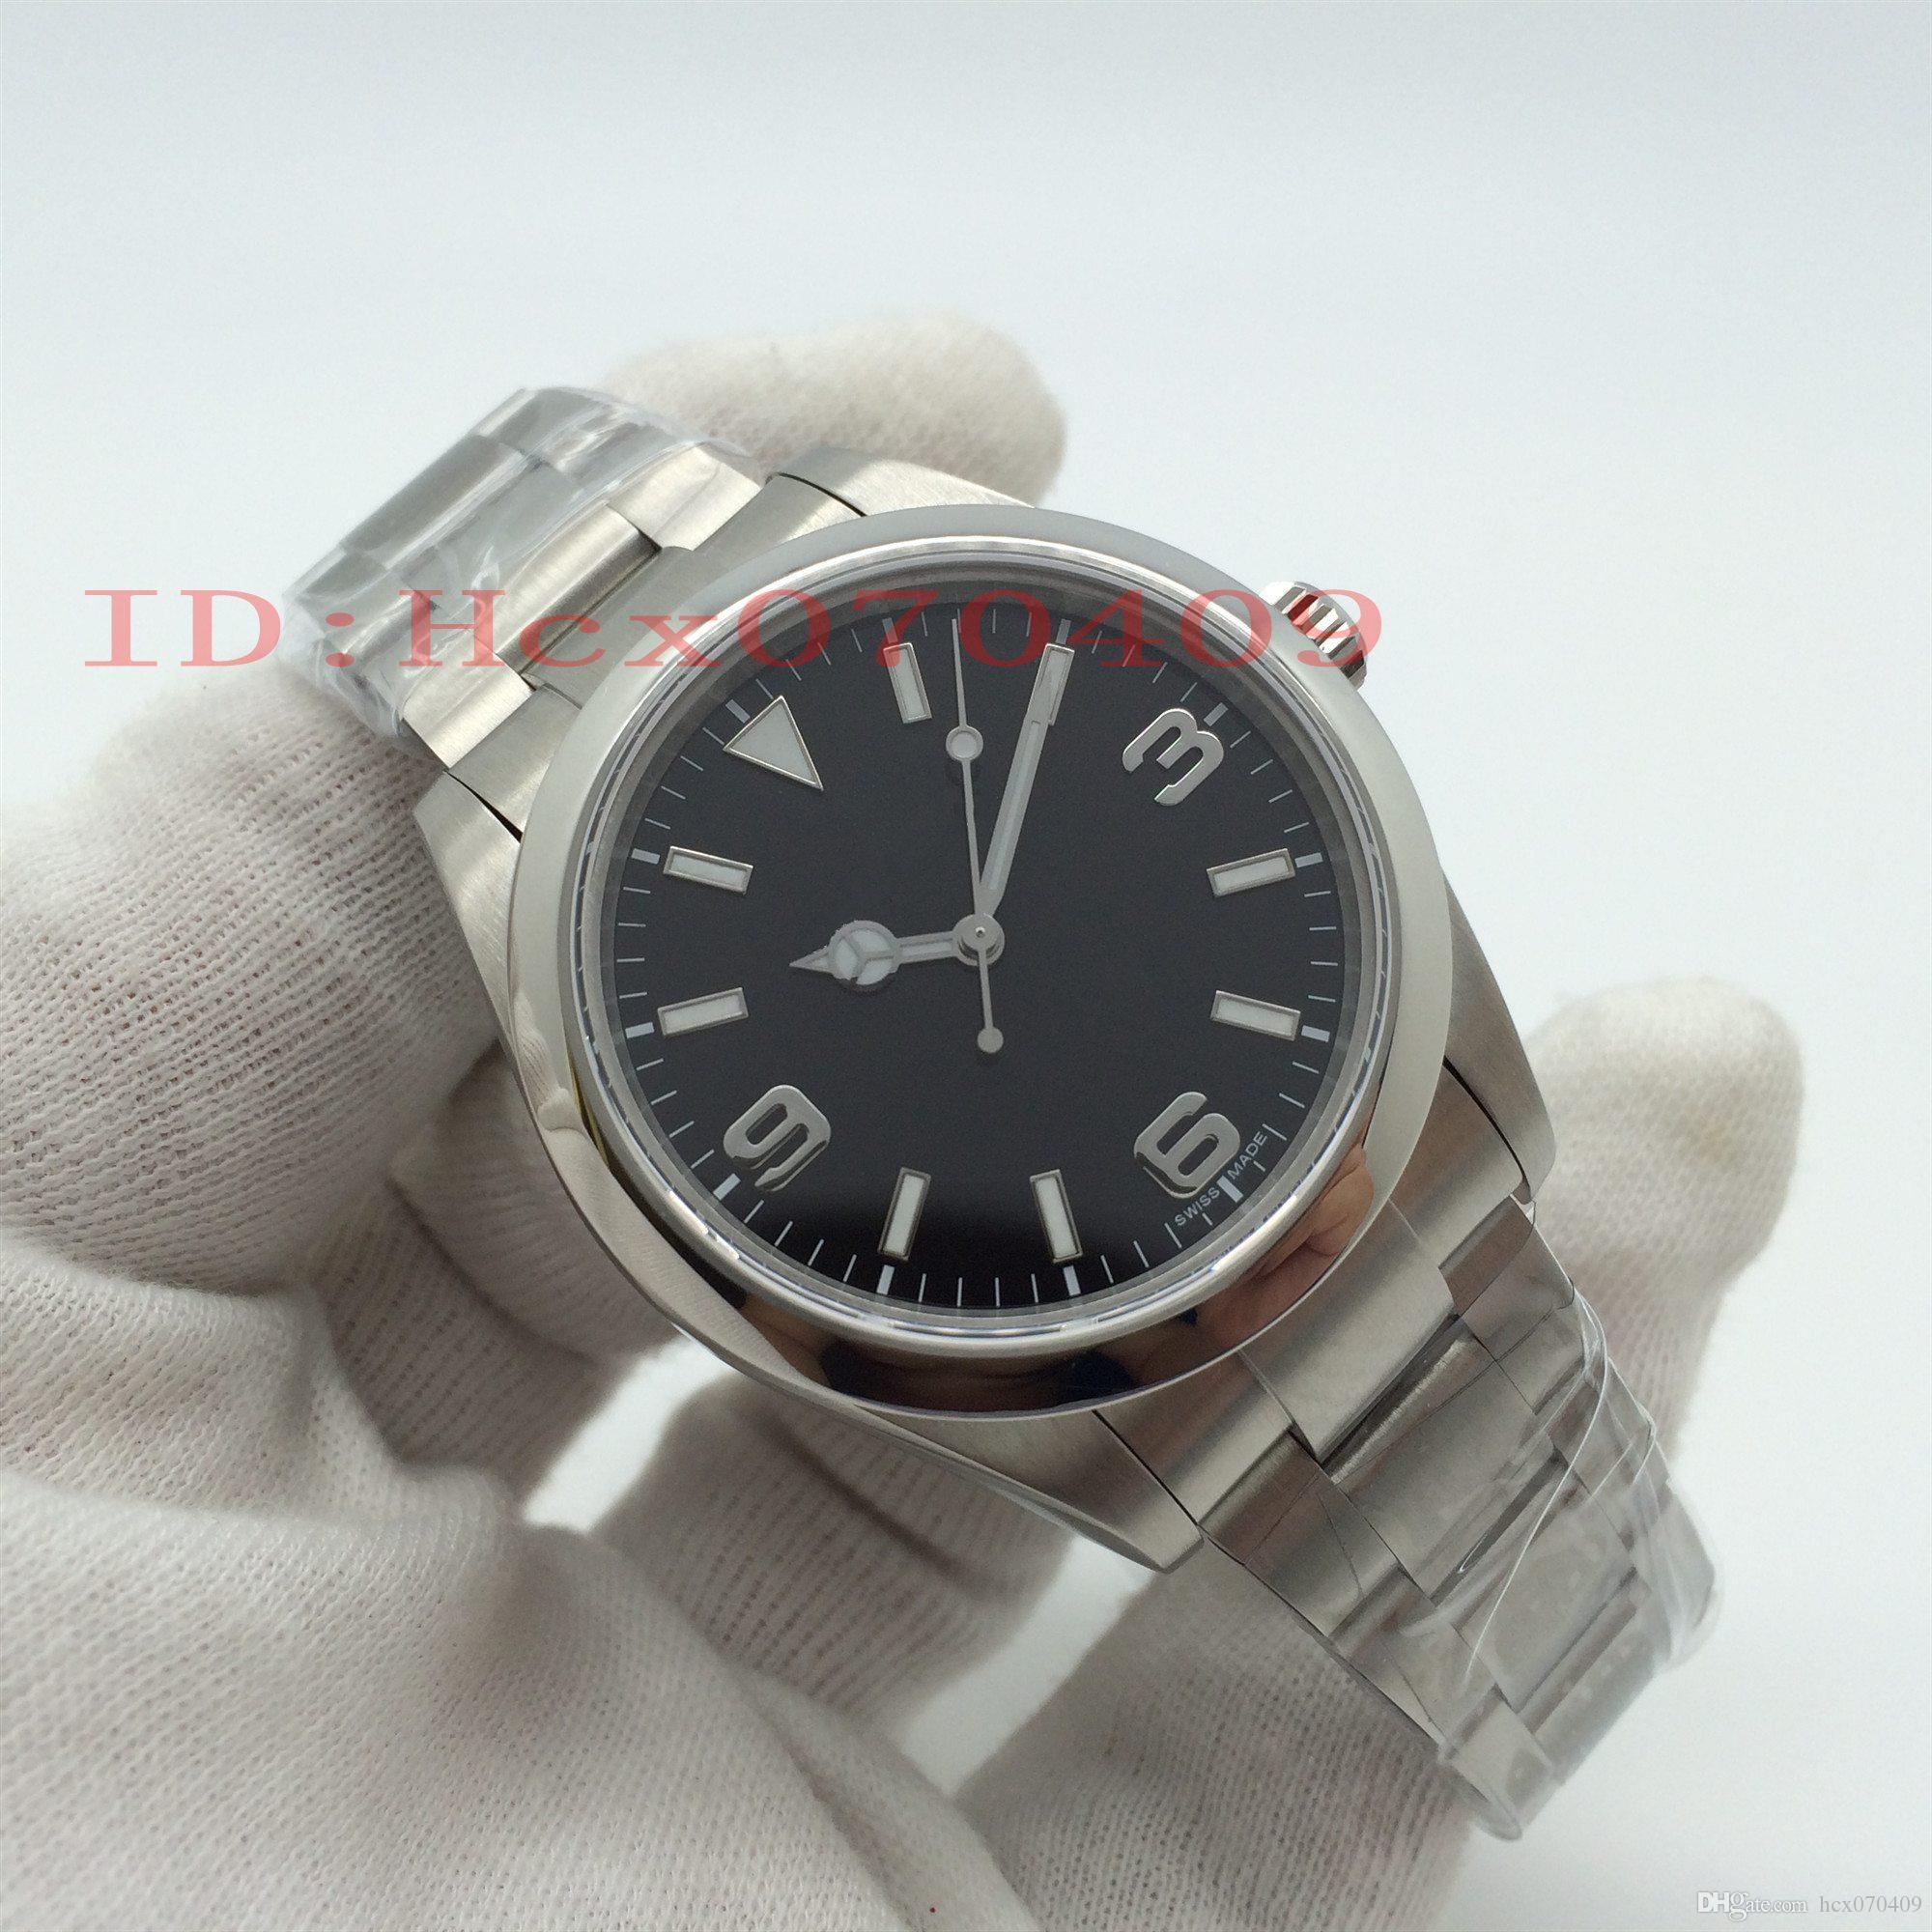 Beste Qualität JF-Hersteller 39mm 214270 Schwarz Cal Dial. 3132 Bewegung Eta Stahl Automatik Herren Uhren Herrenarmbanduhr V2 Ultimate Edition